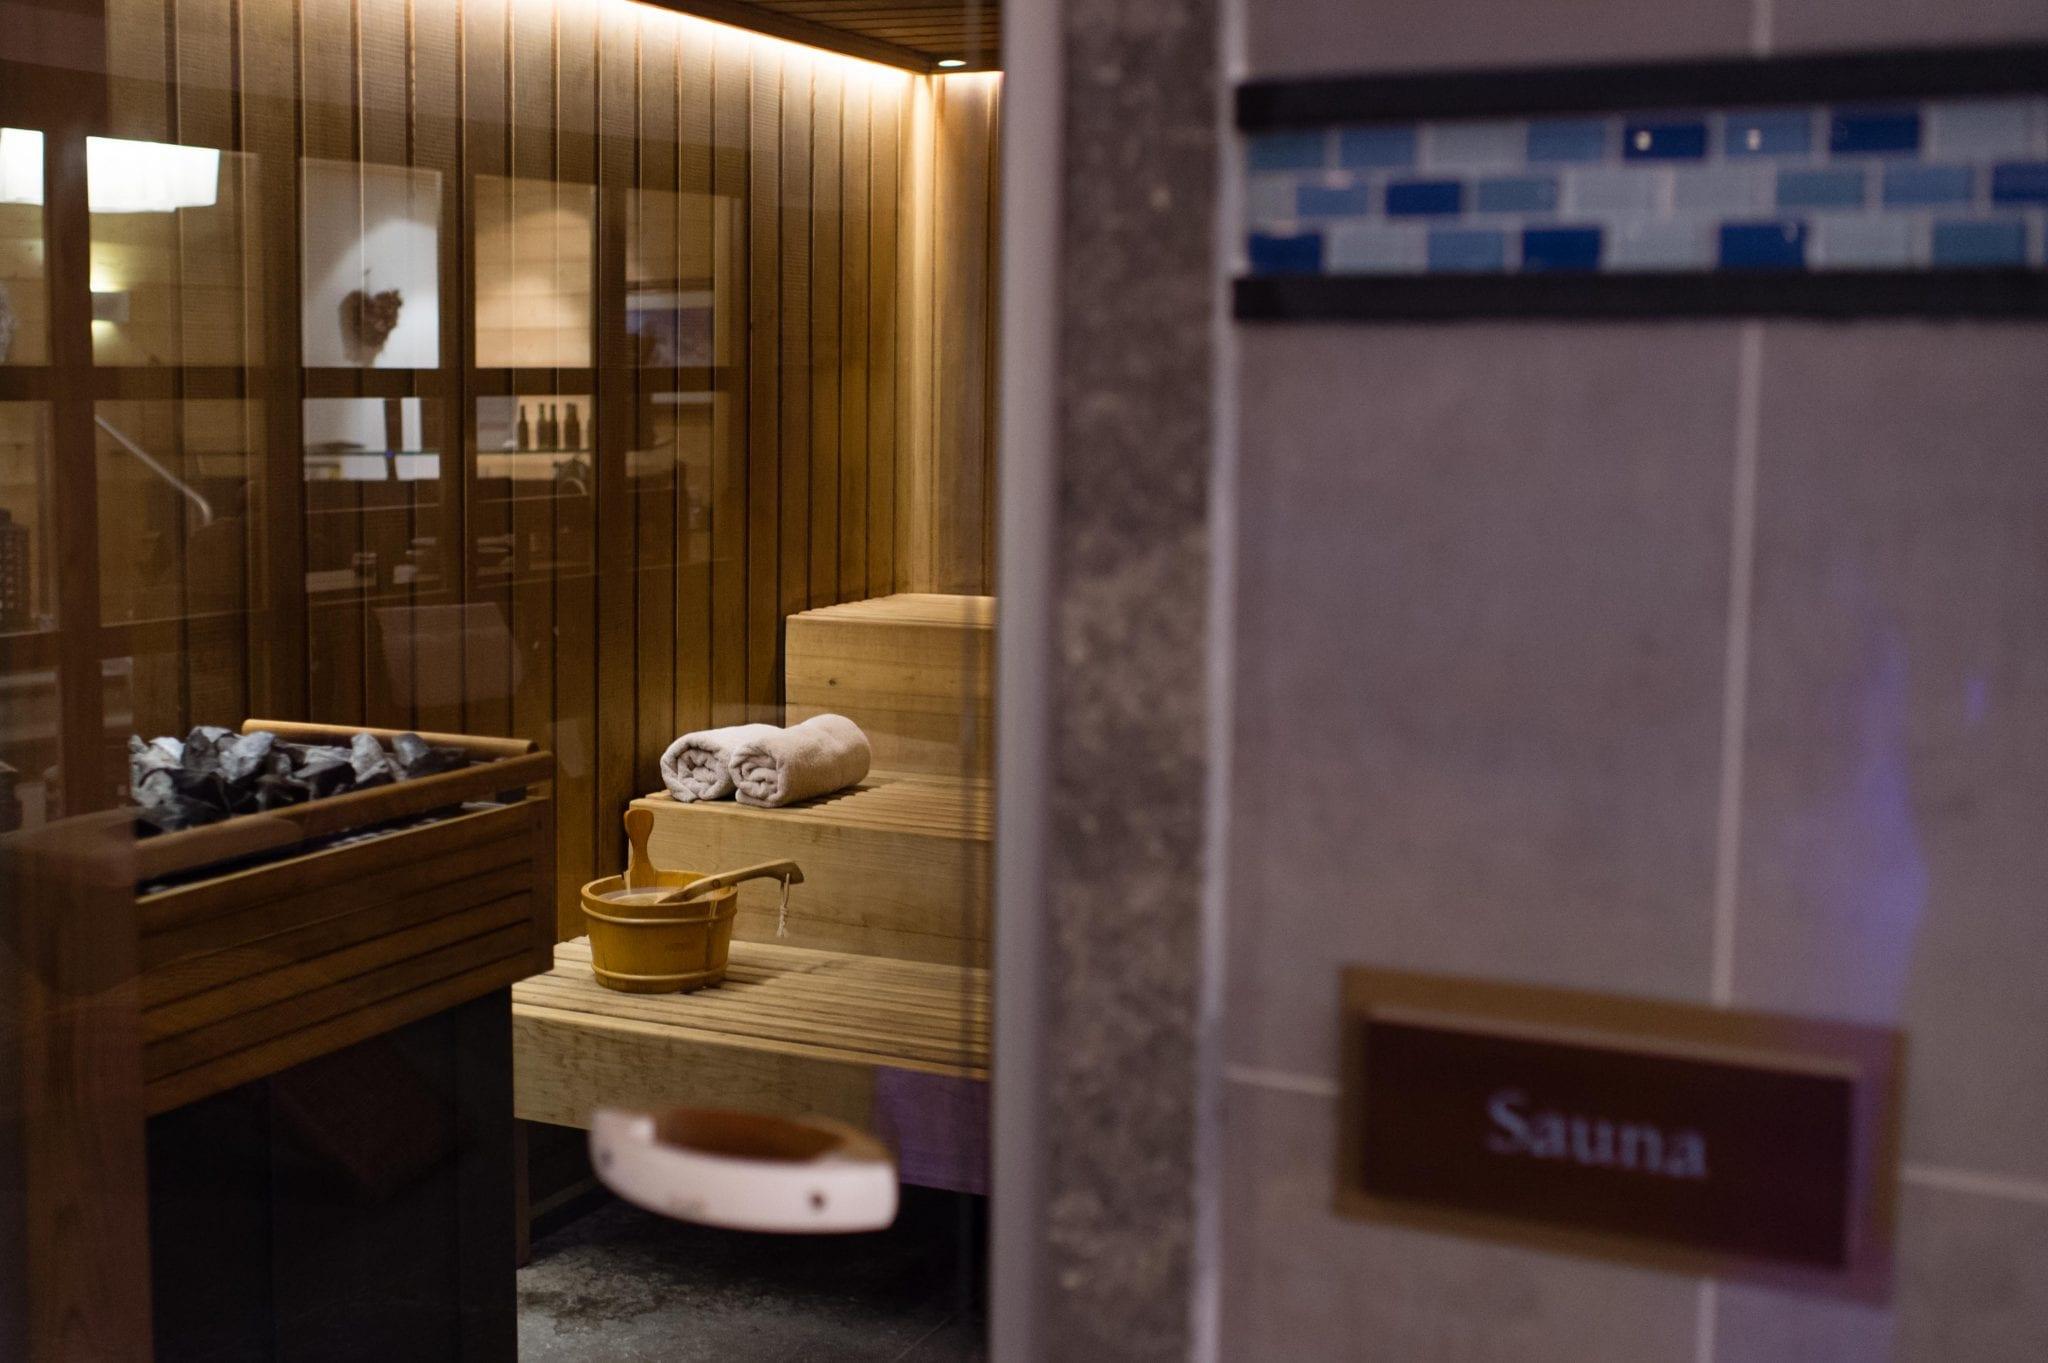 portetta-spa-sauna-amy-murrell